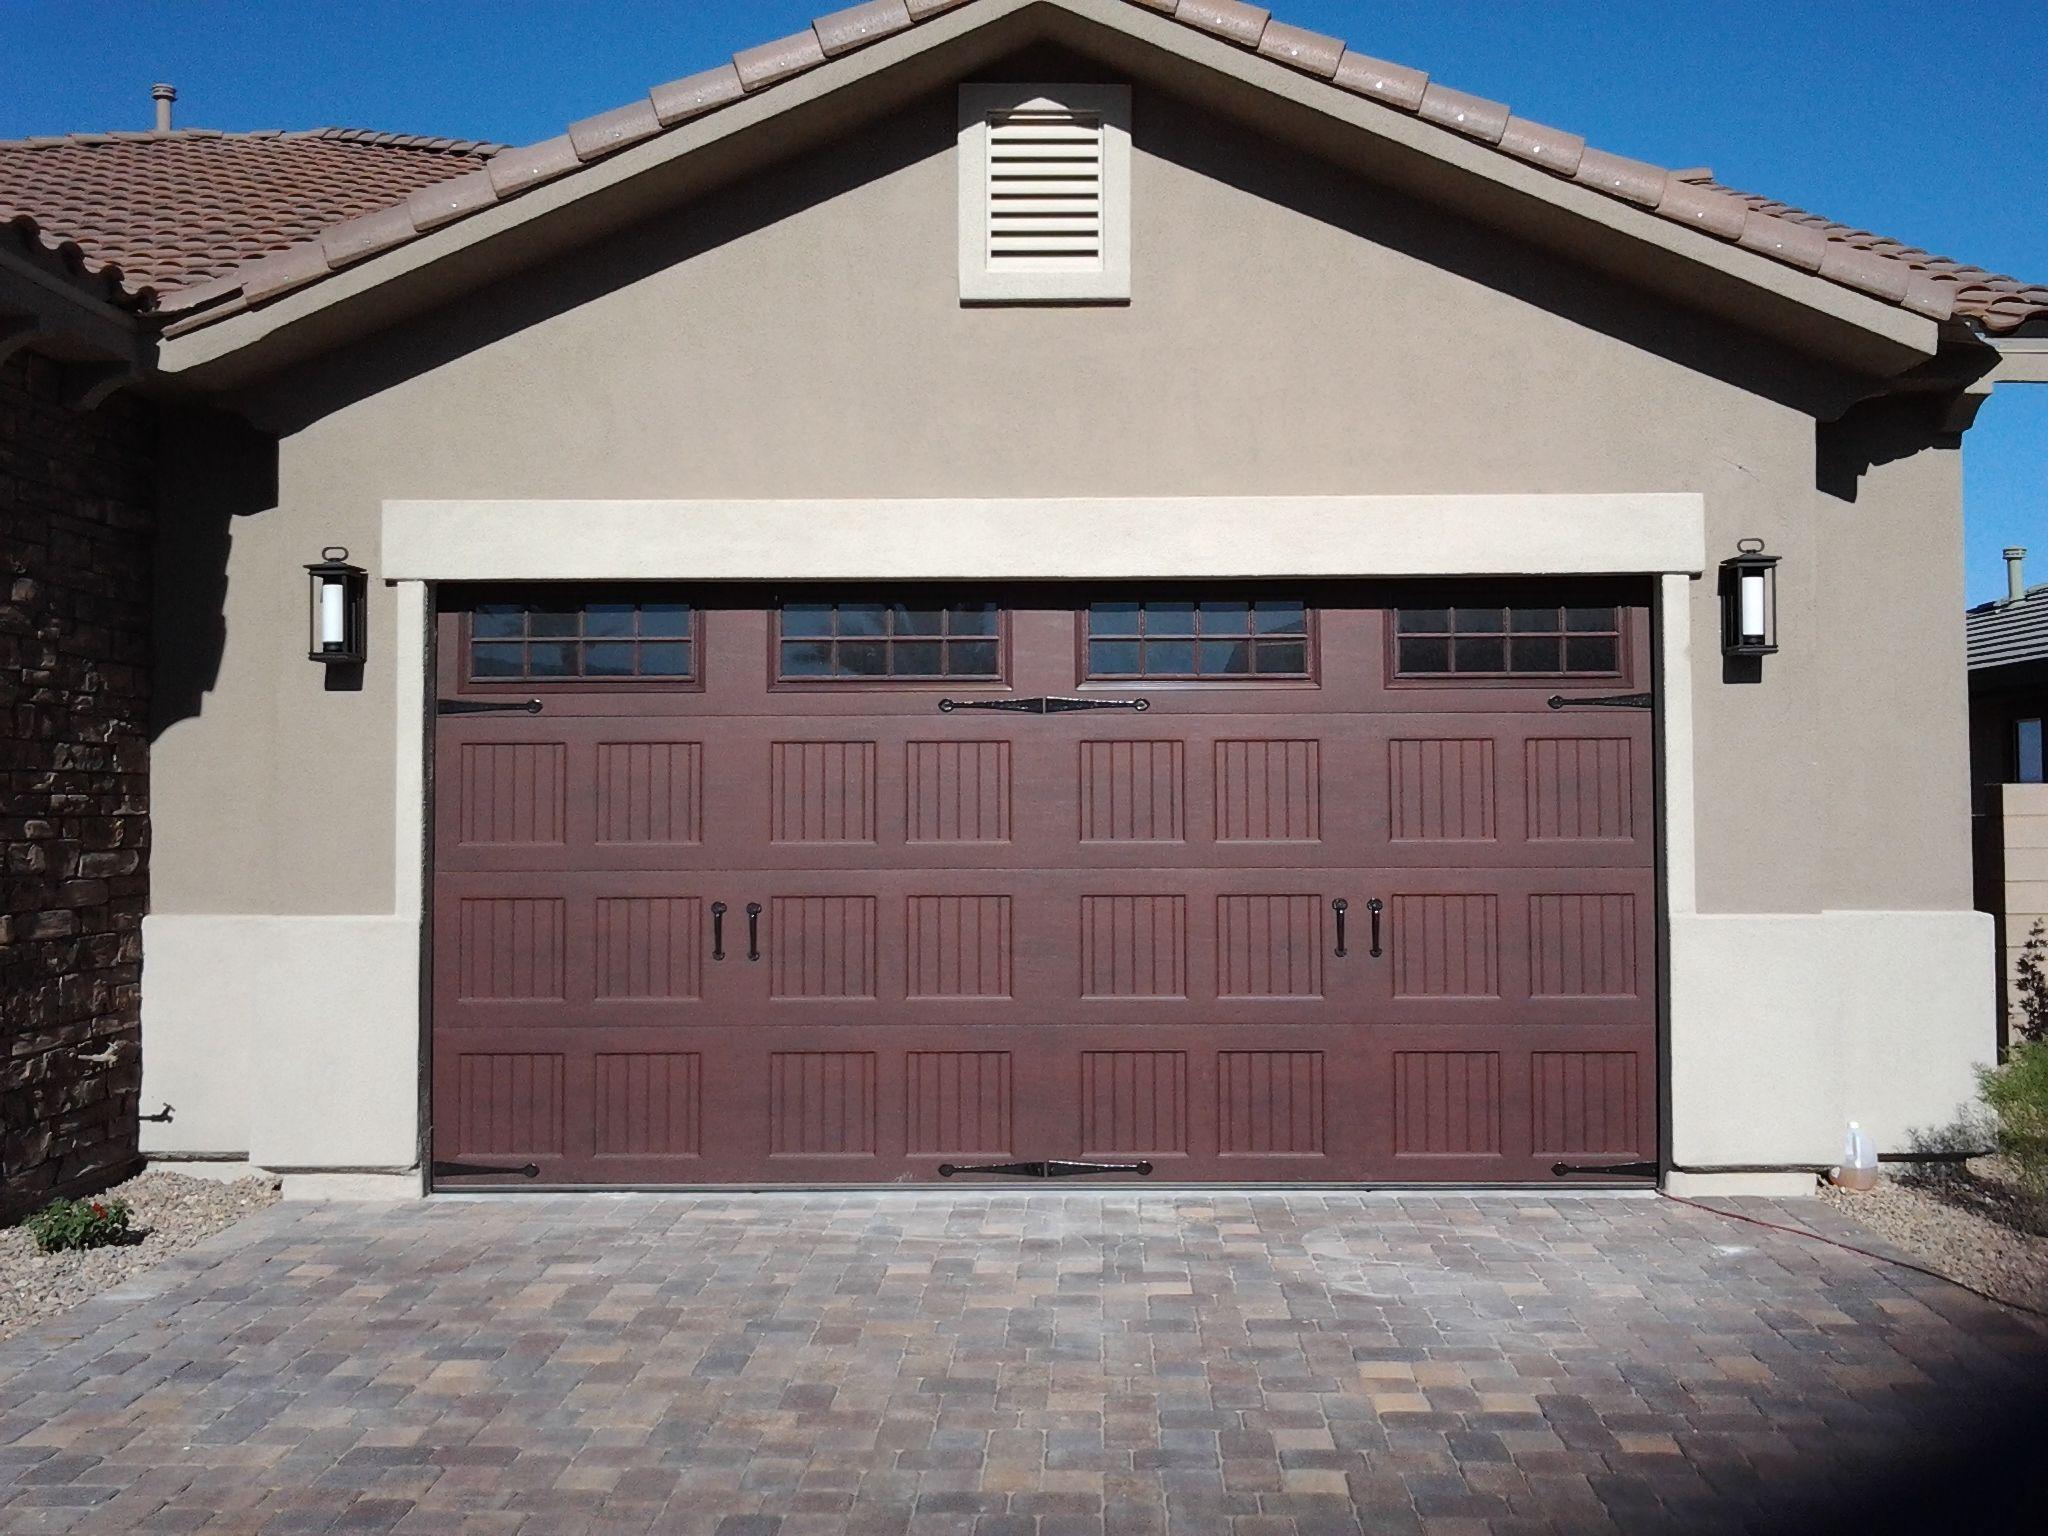 Charmant Double Car Garage Door With Windows